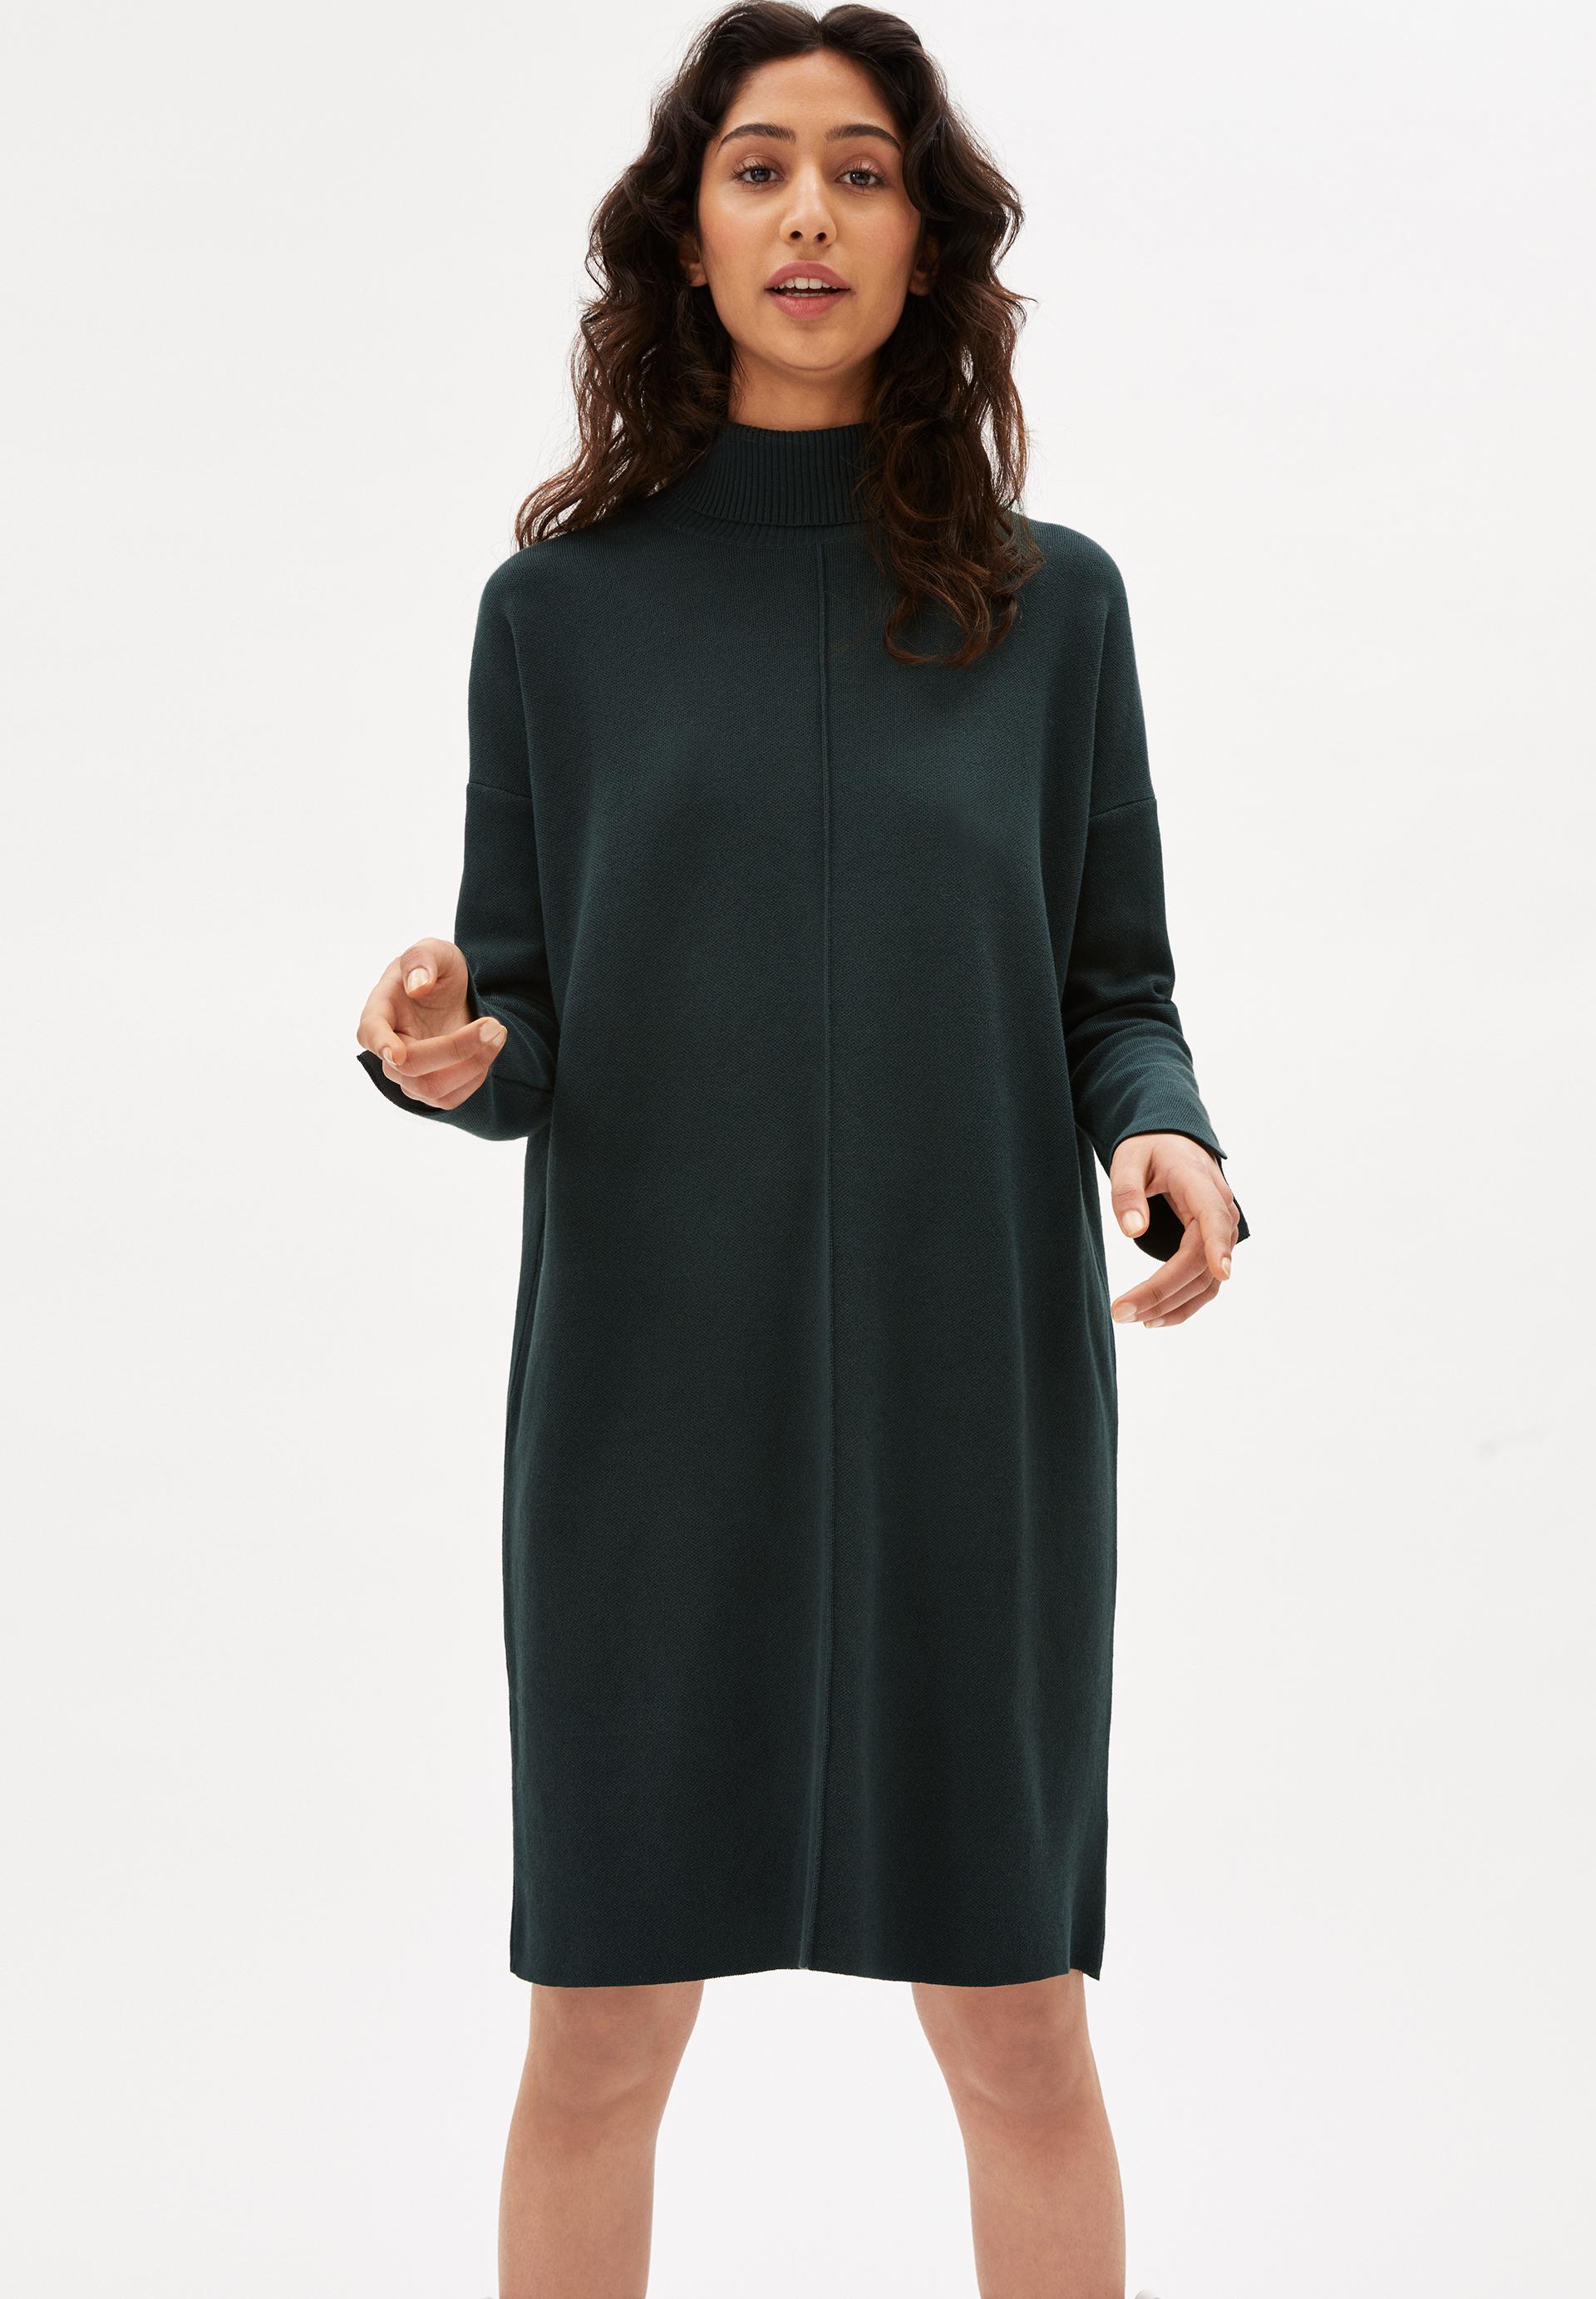 SIENNAA Knit Dress made of Organic Cotton